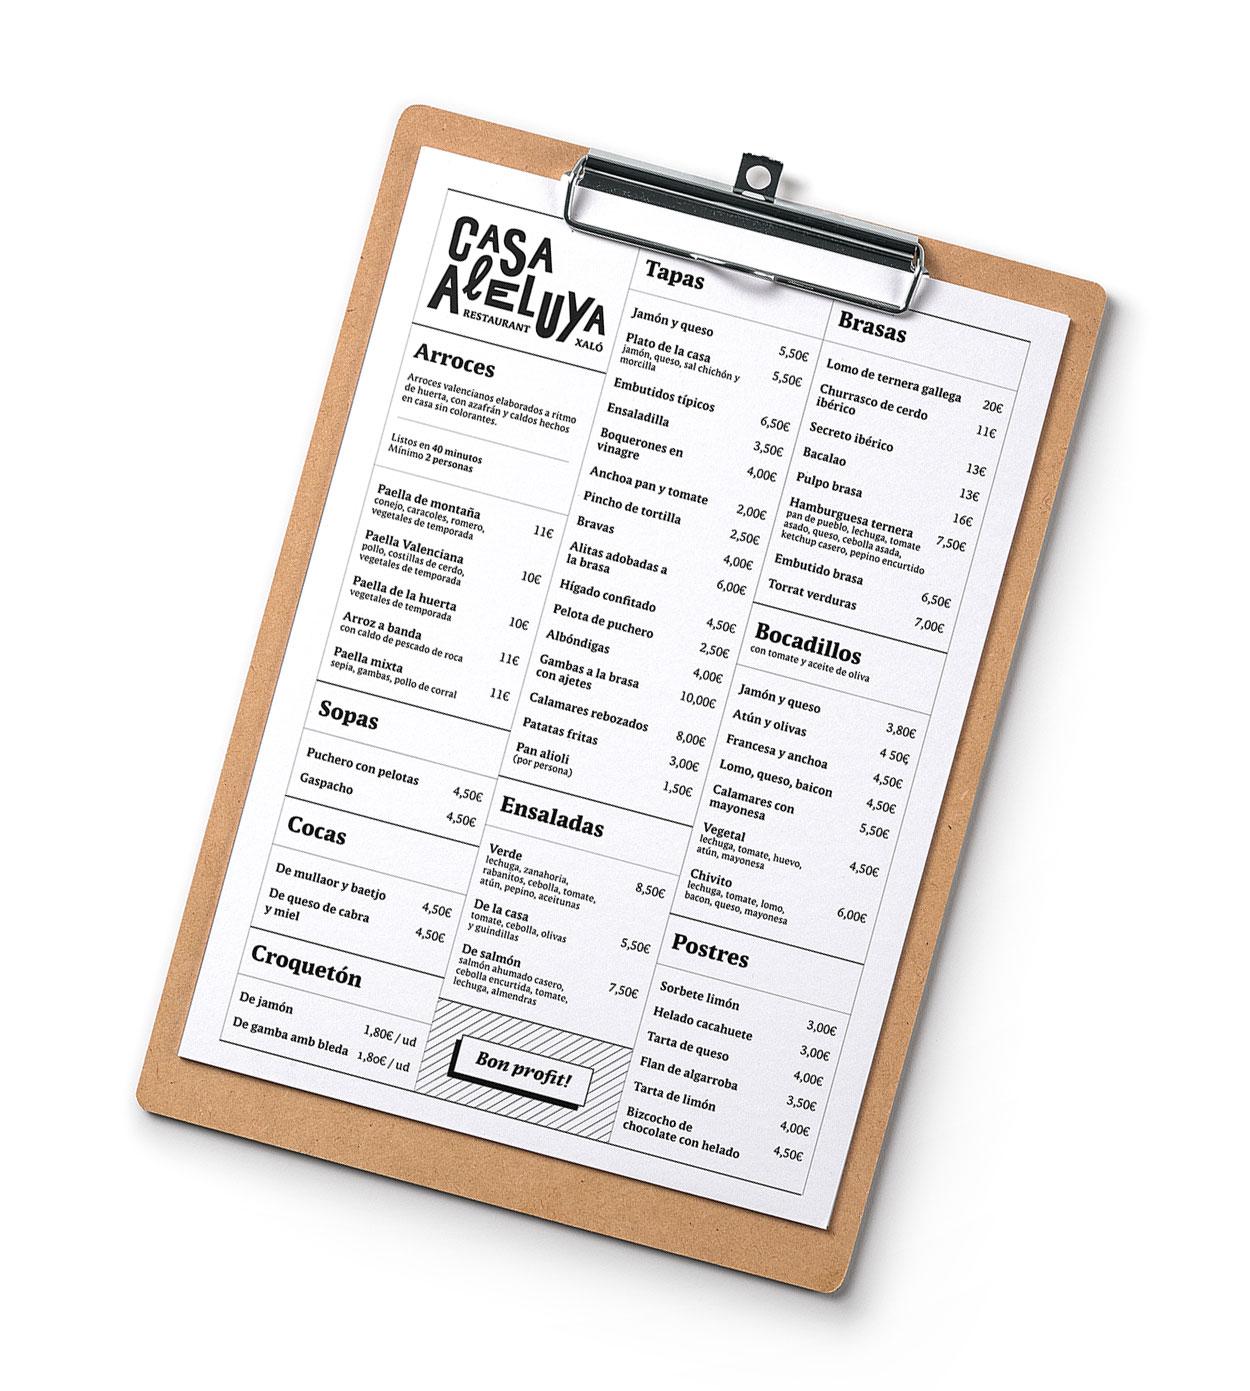 Diseño Carta Restaurante Casa Aleluya